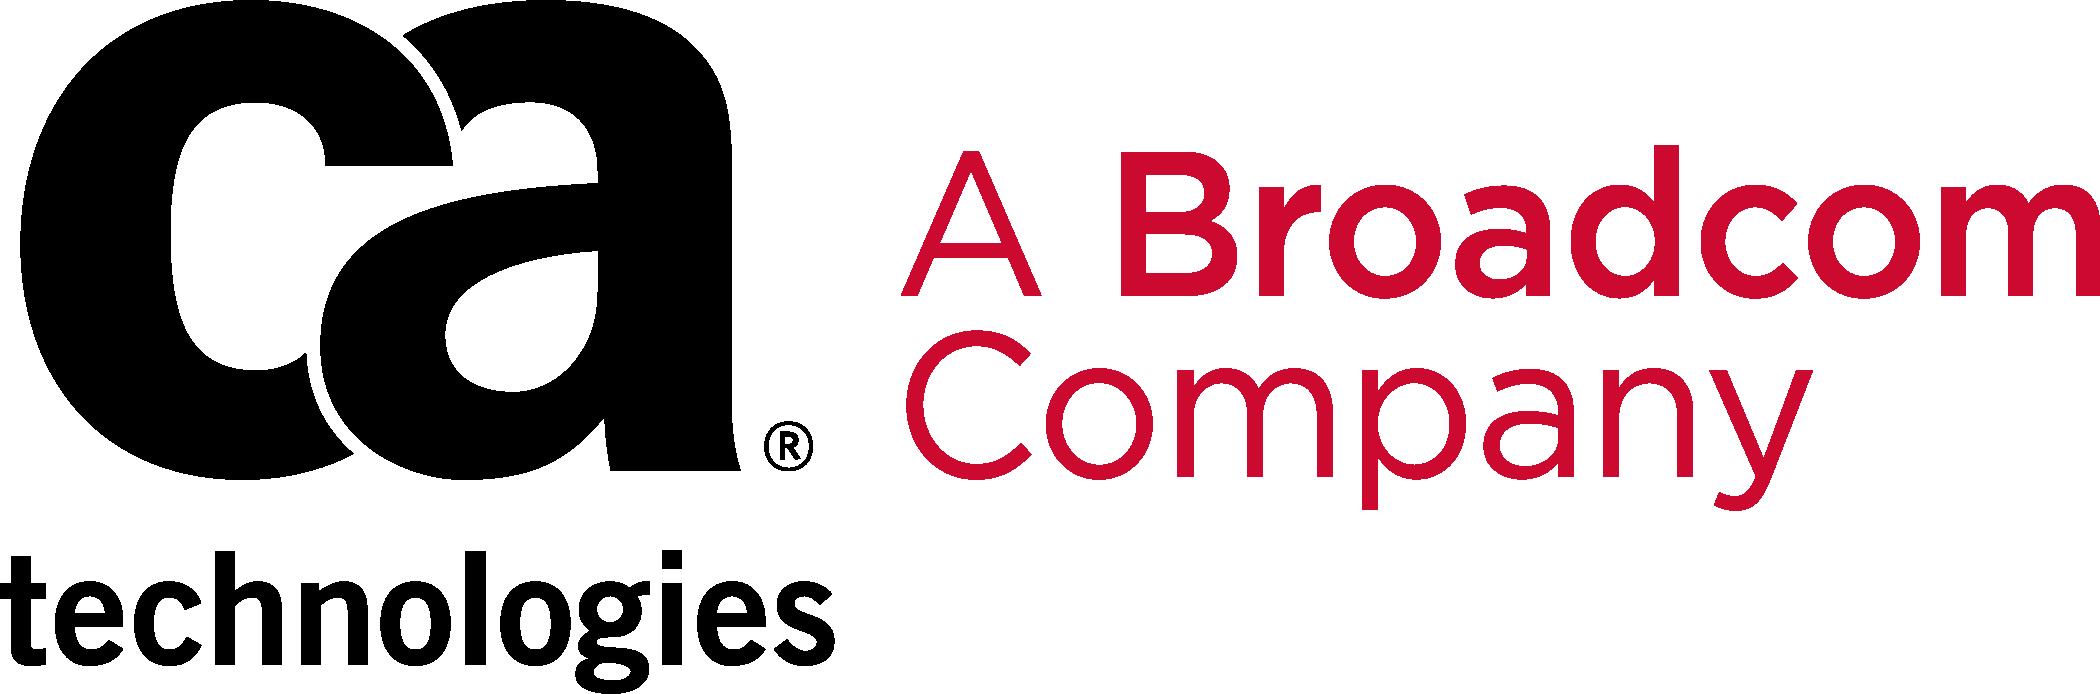 CA-Broadcom_Horizontal_red-black.png